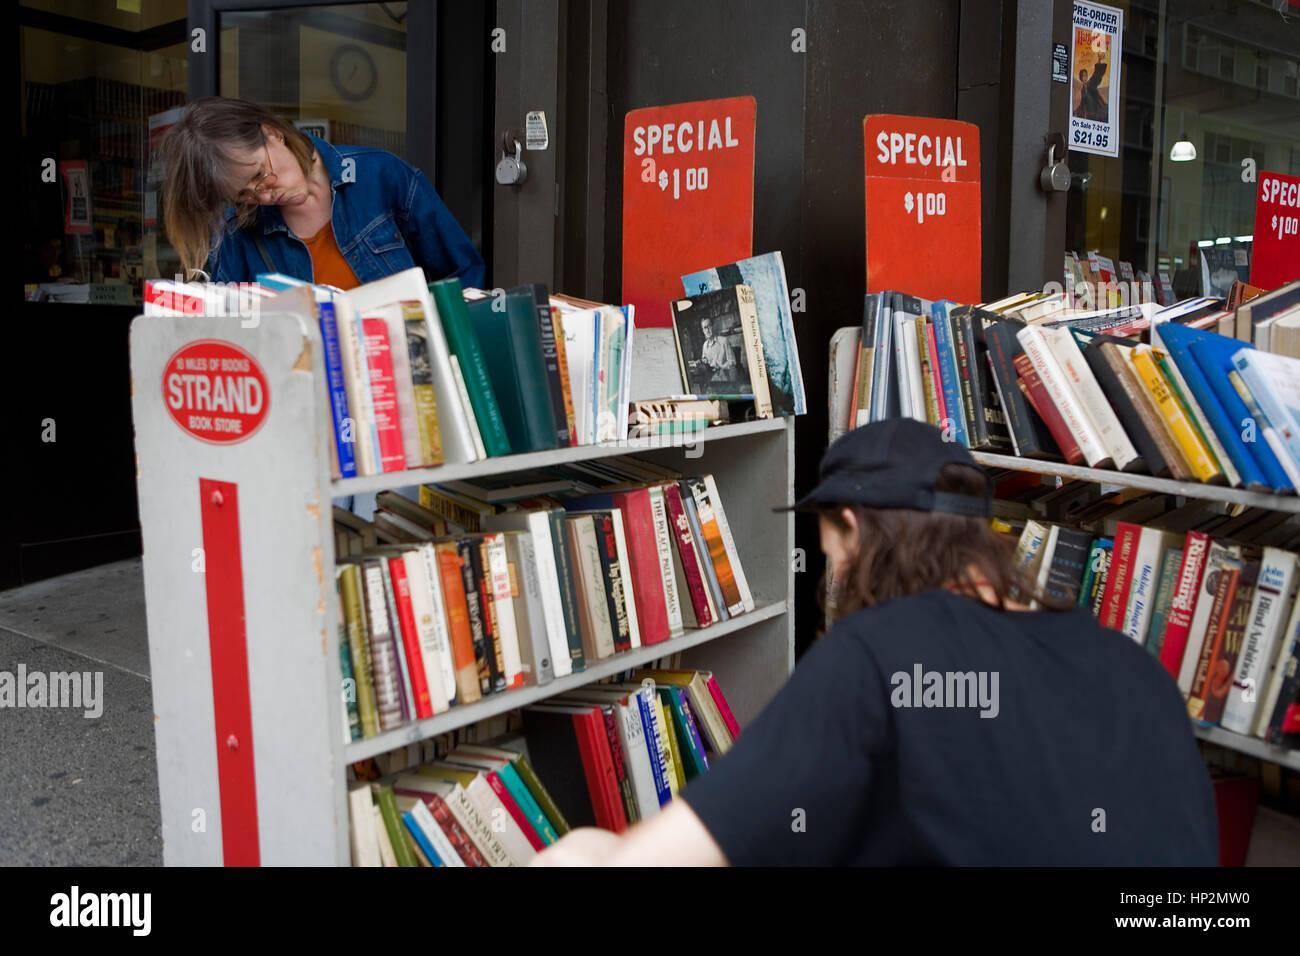 Strand Book Store. 828 Broadway at 12th St,New York City, USA, www.strandbooks.com - Stock Image